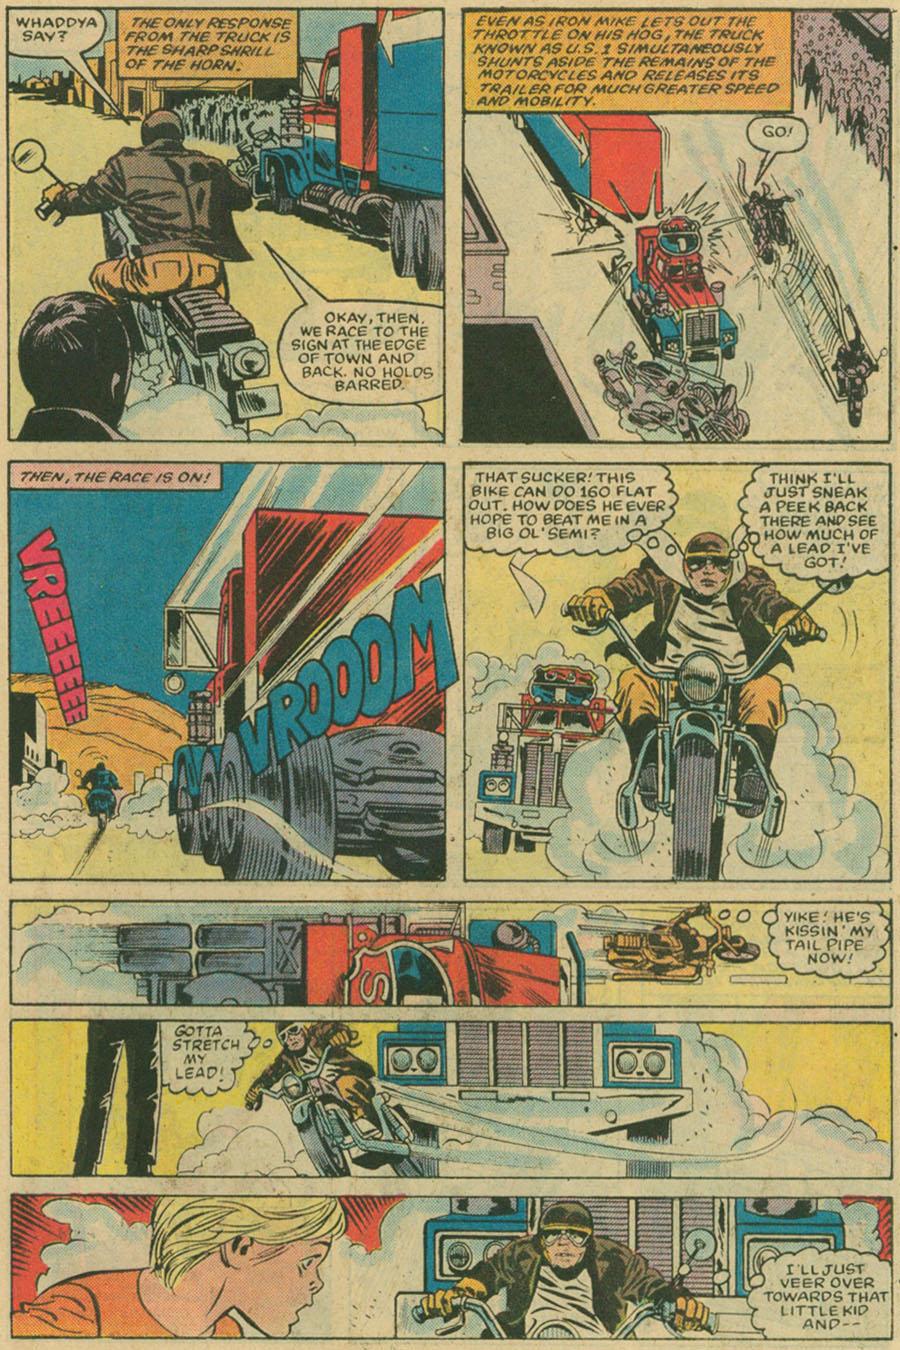 Read online U.S. 1 comic -  Issue #6 - 20